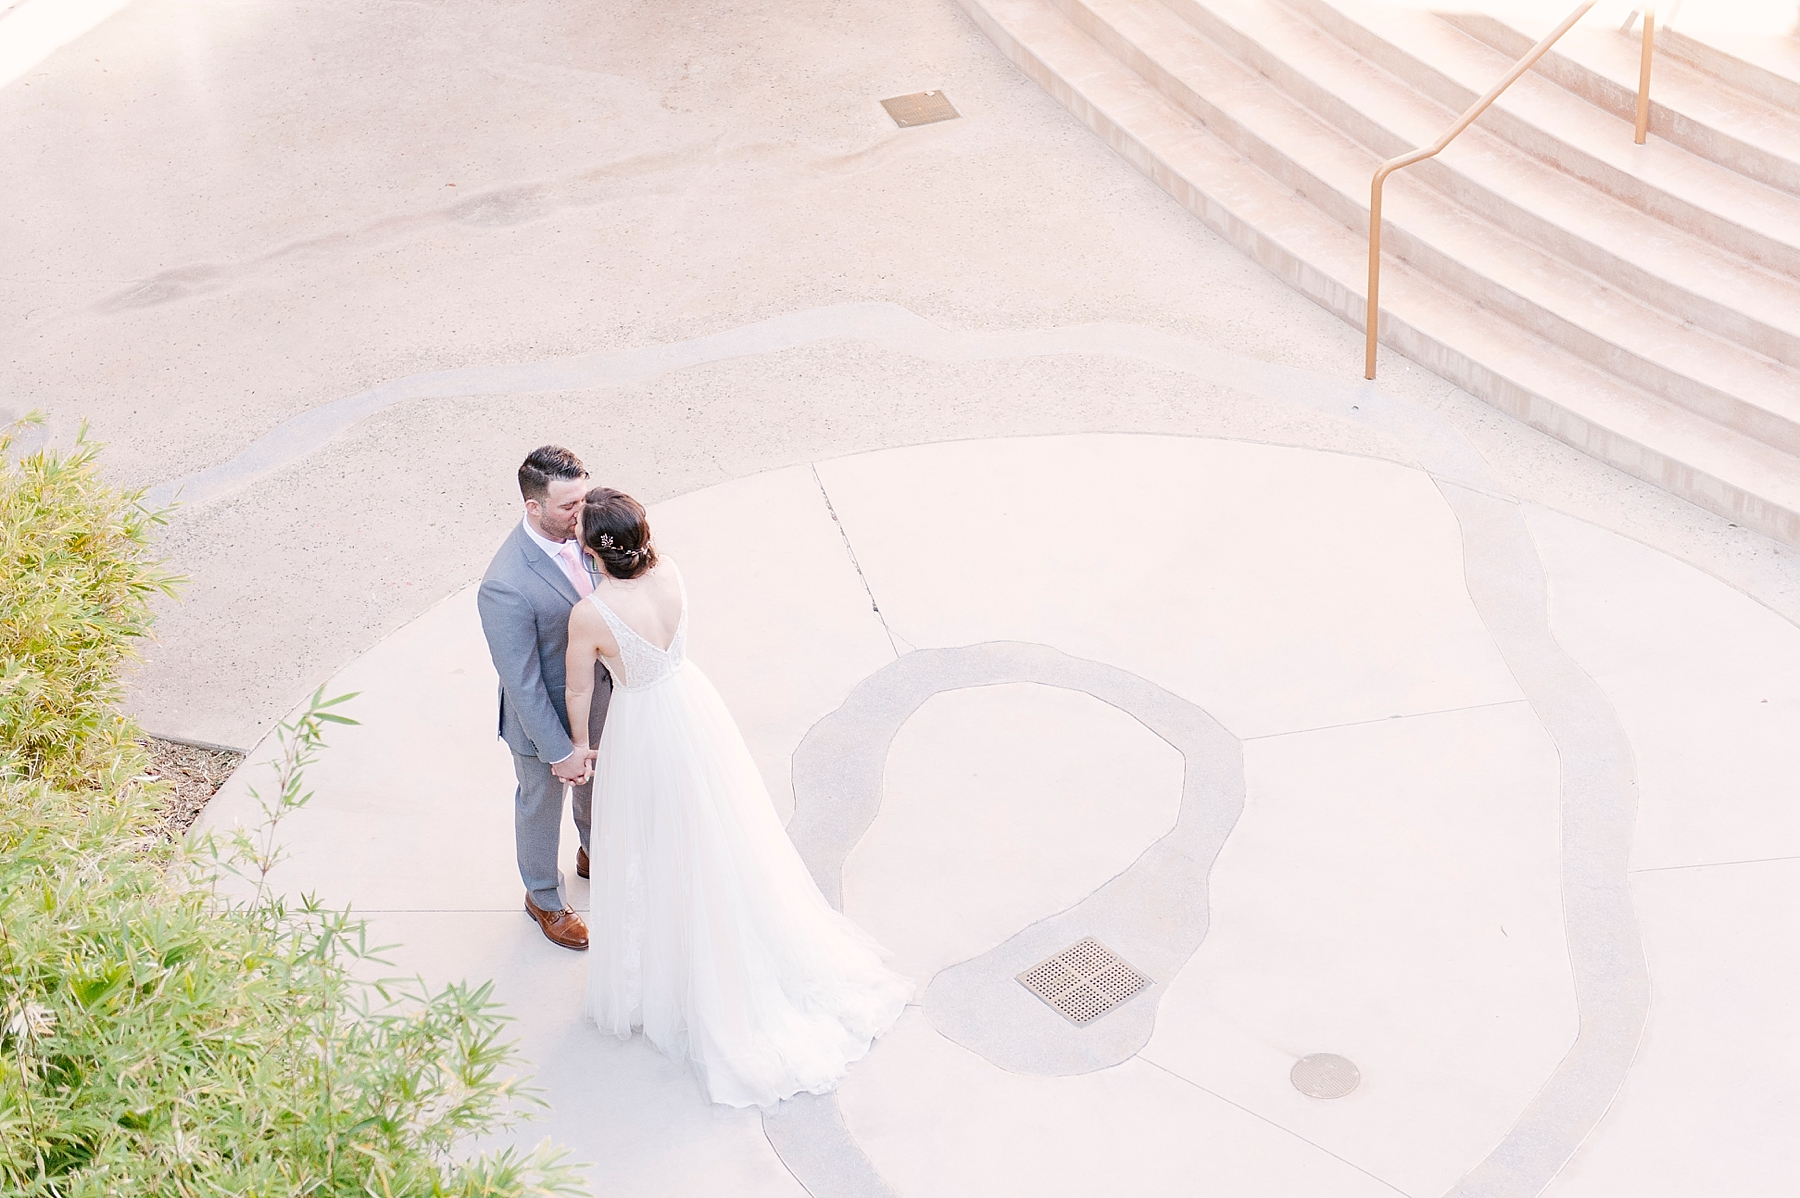 springs-preserve-wedding-las-vegas-destination-photography-the-emerics-20.jpg